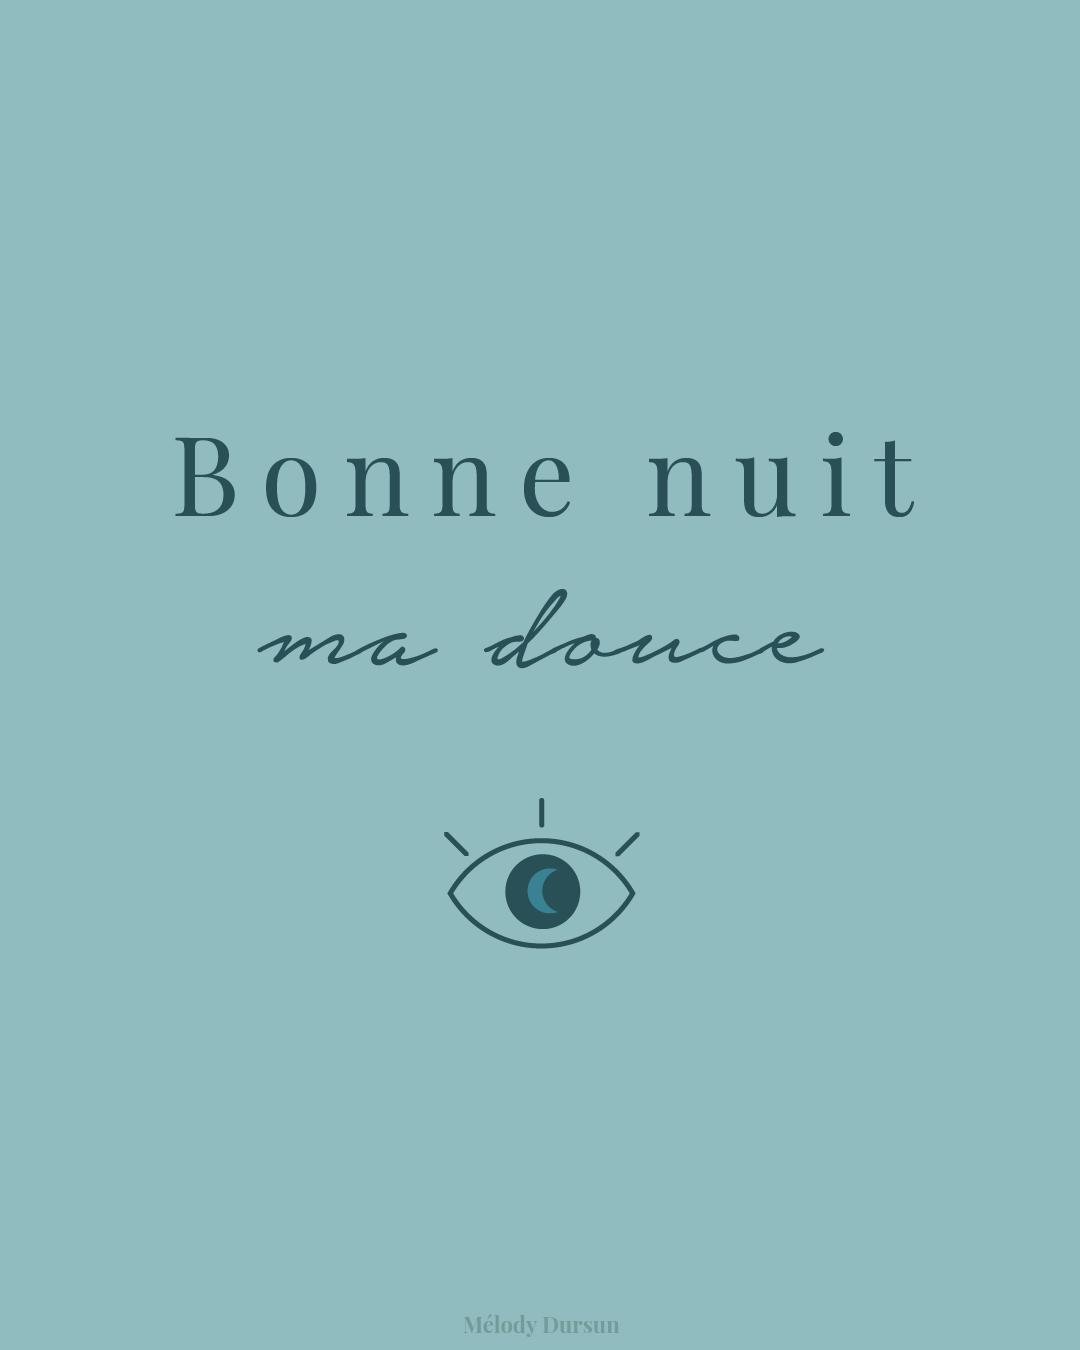 melodydursun-bonne-nuit-ma-douce